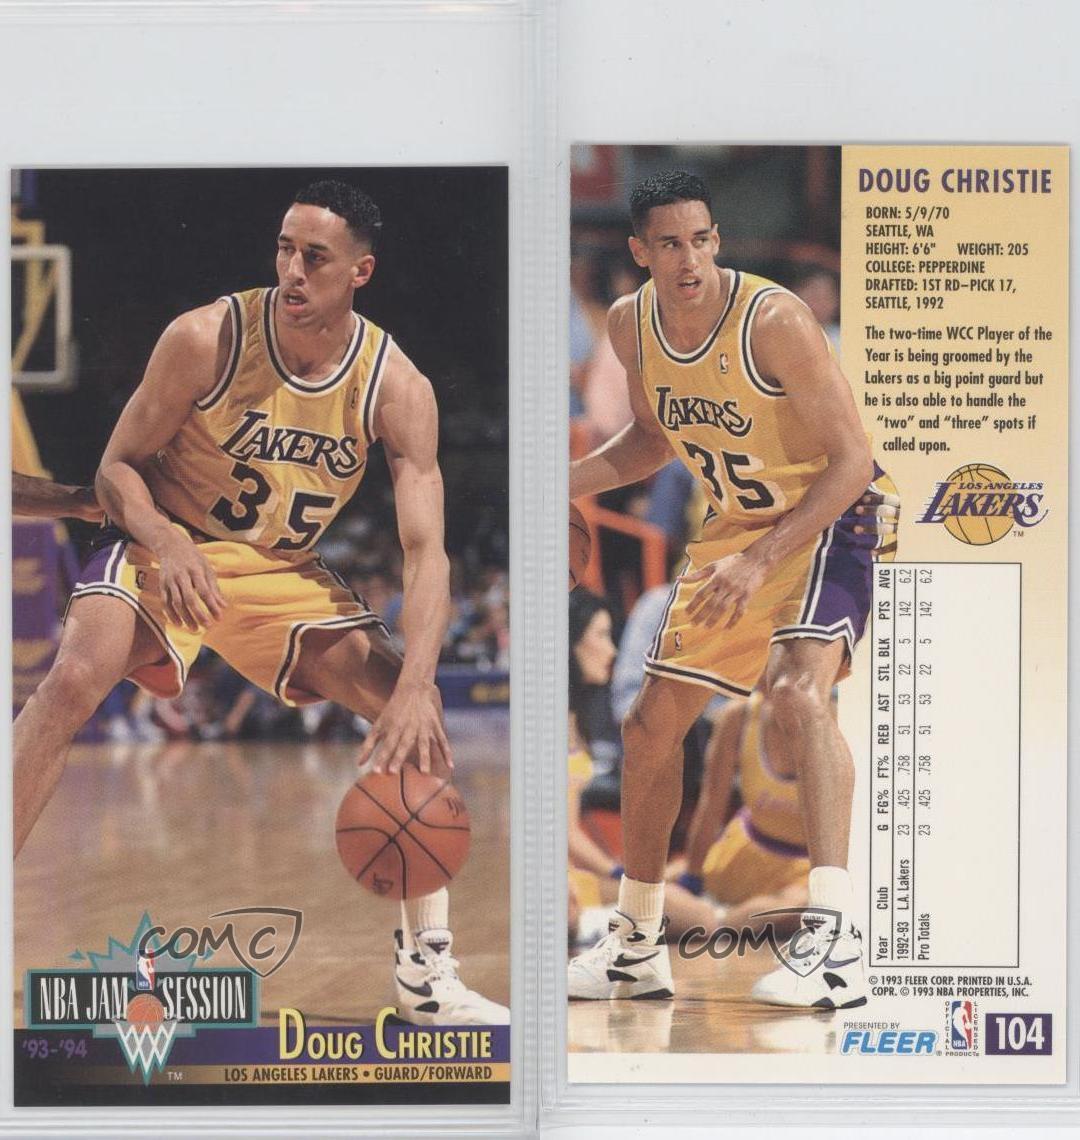 1993-94 NBA Jam Session #104 Doug Christie Los Angeles